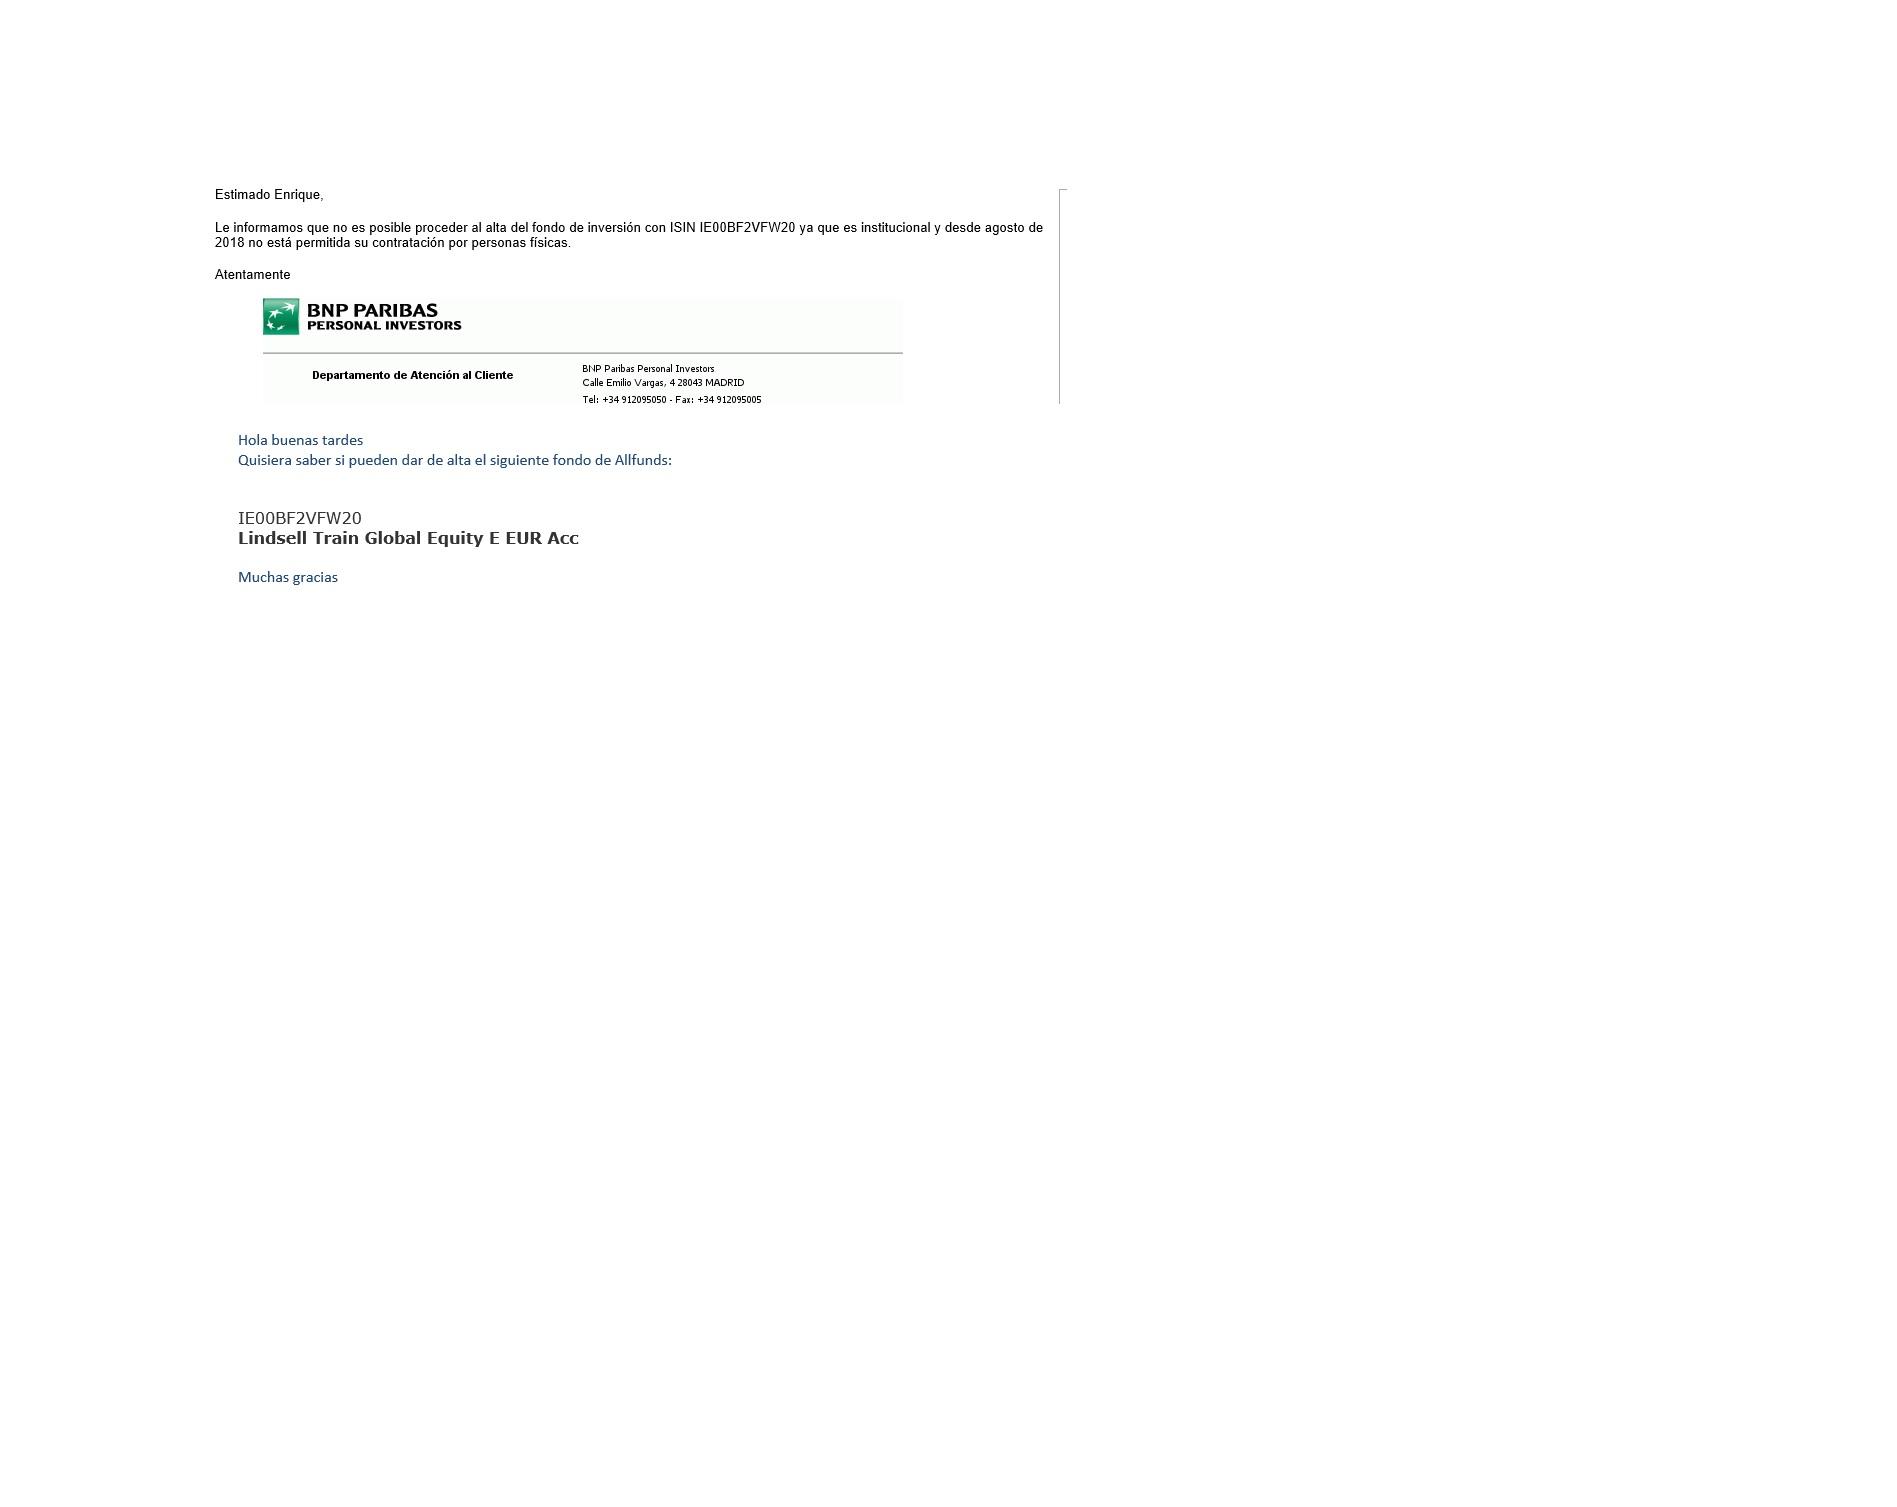 Consulta del fondo Lindsell, version en euros a Bnp